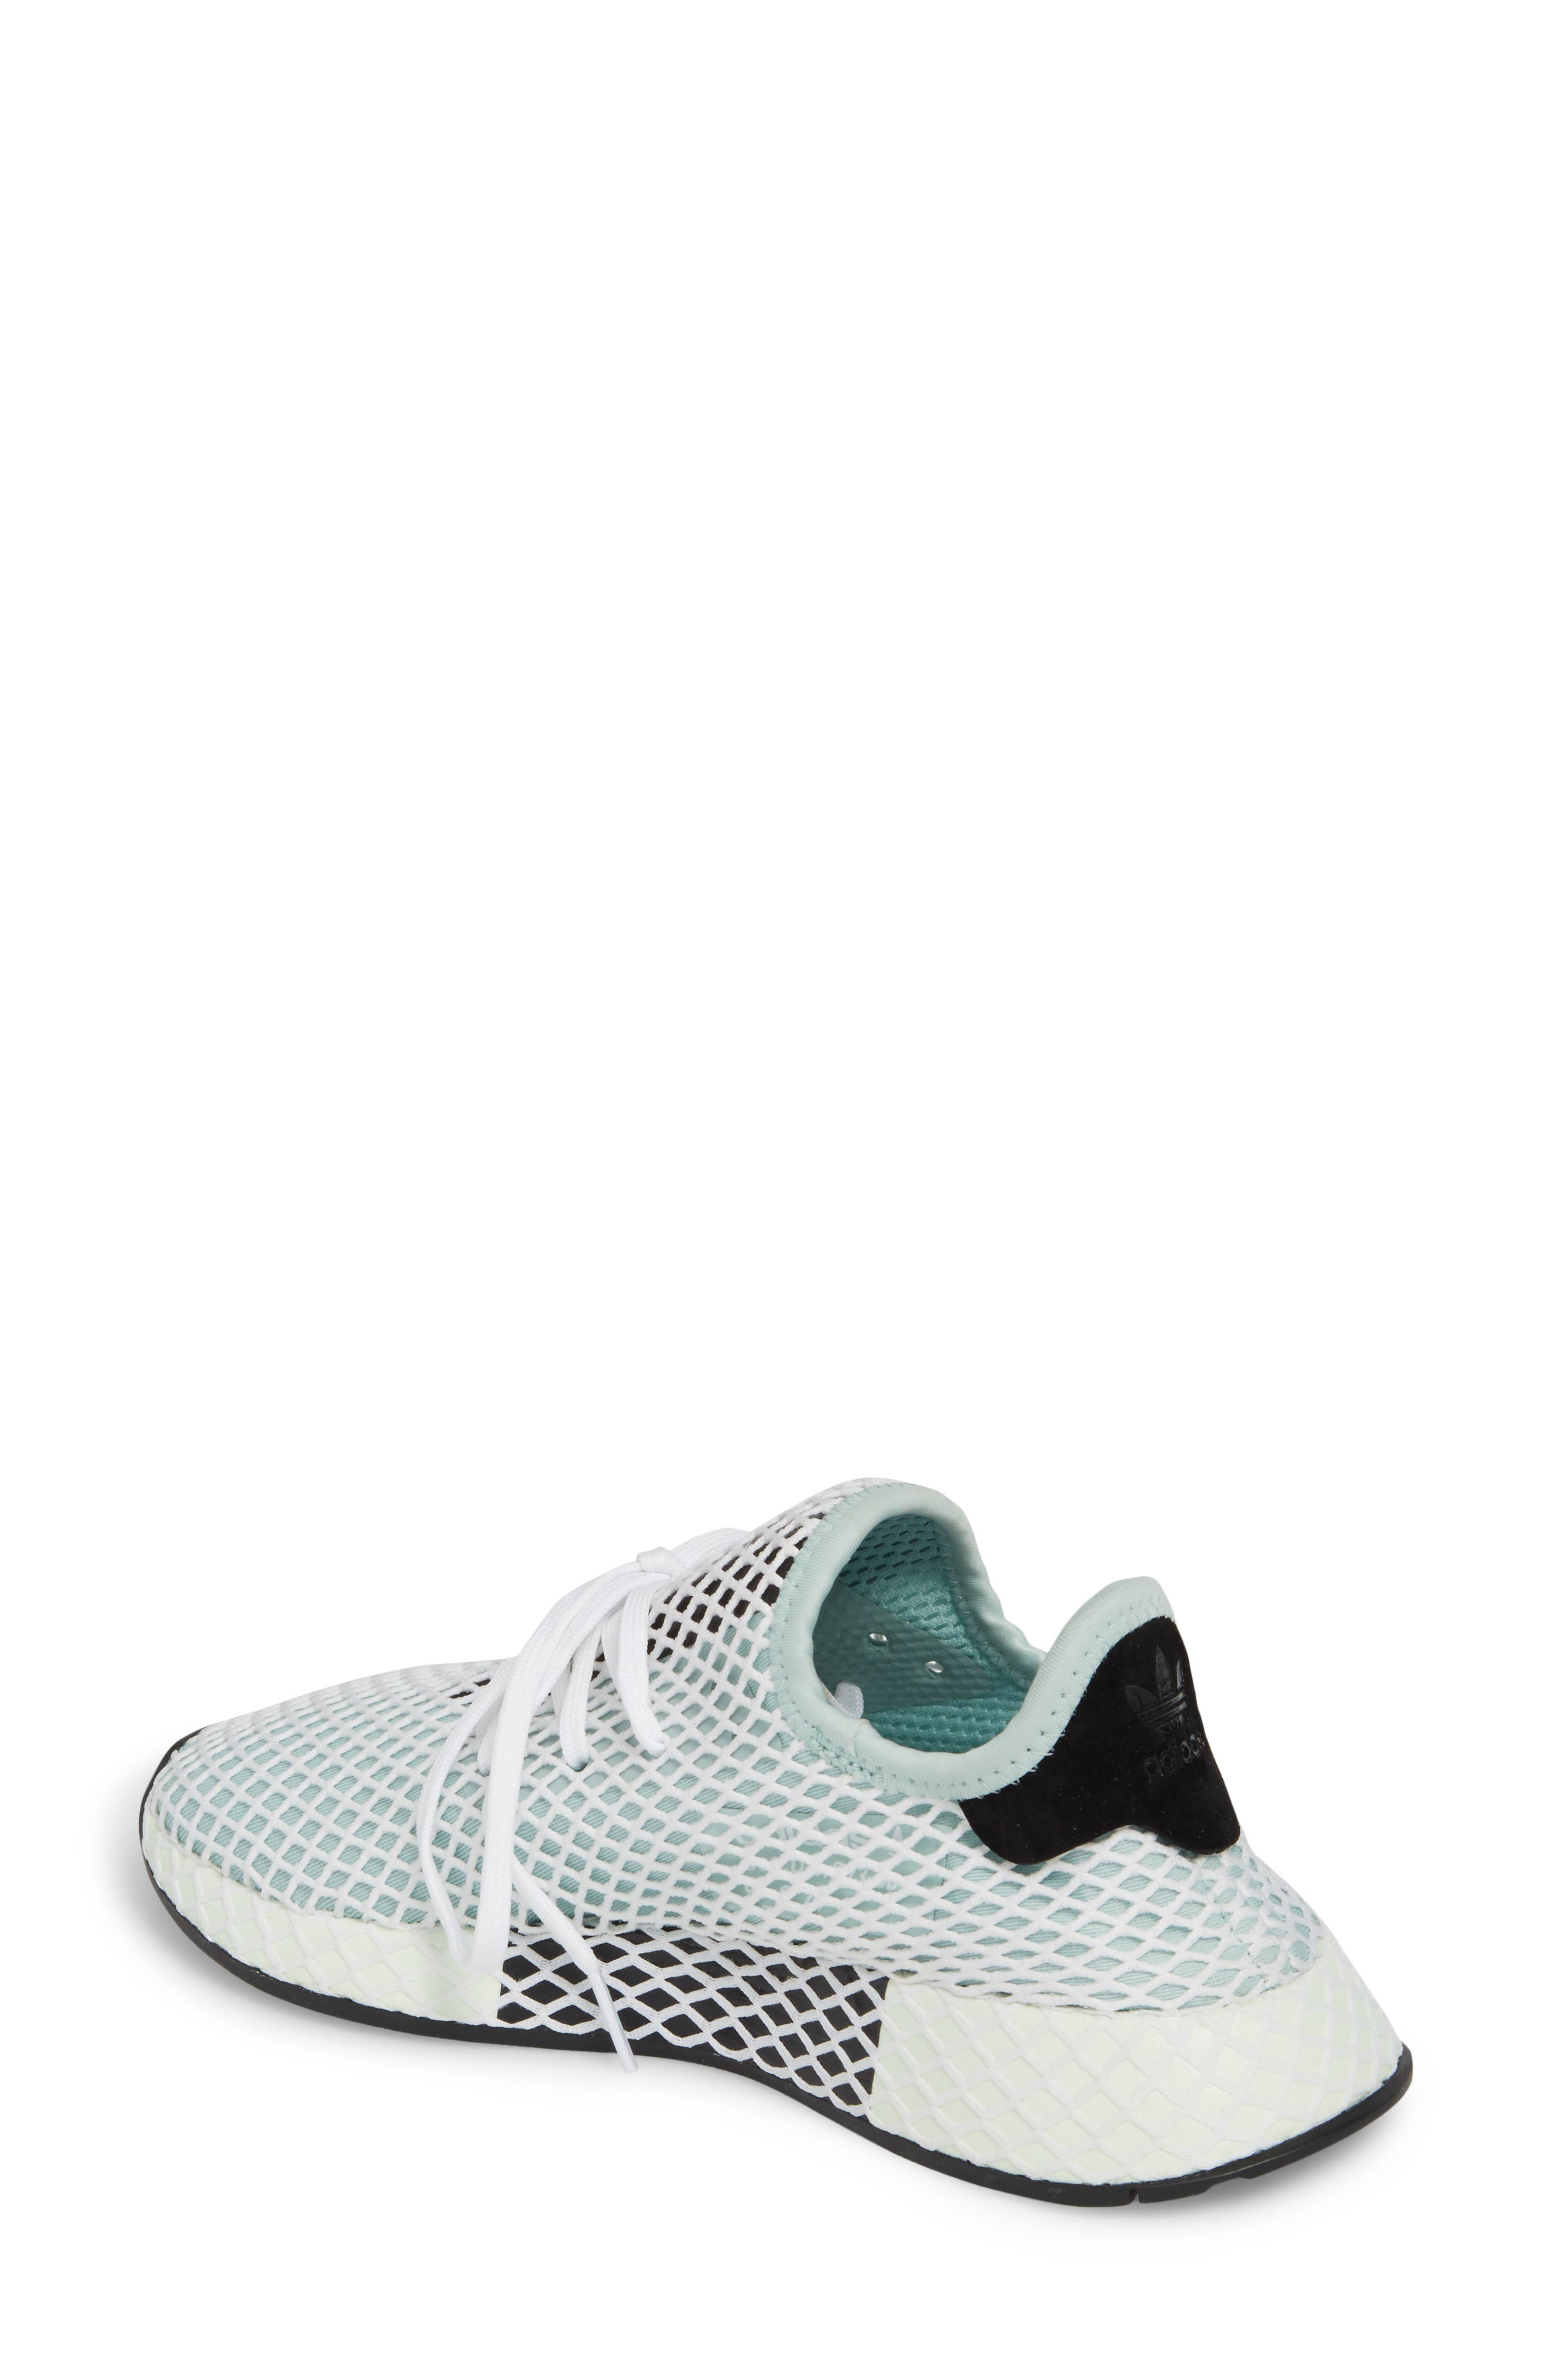 Deerupt Runner Sneaker,                             Alternate thumbnail 2, color,                             ASH GREEN/ ASH GREEN